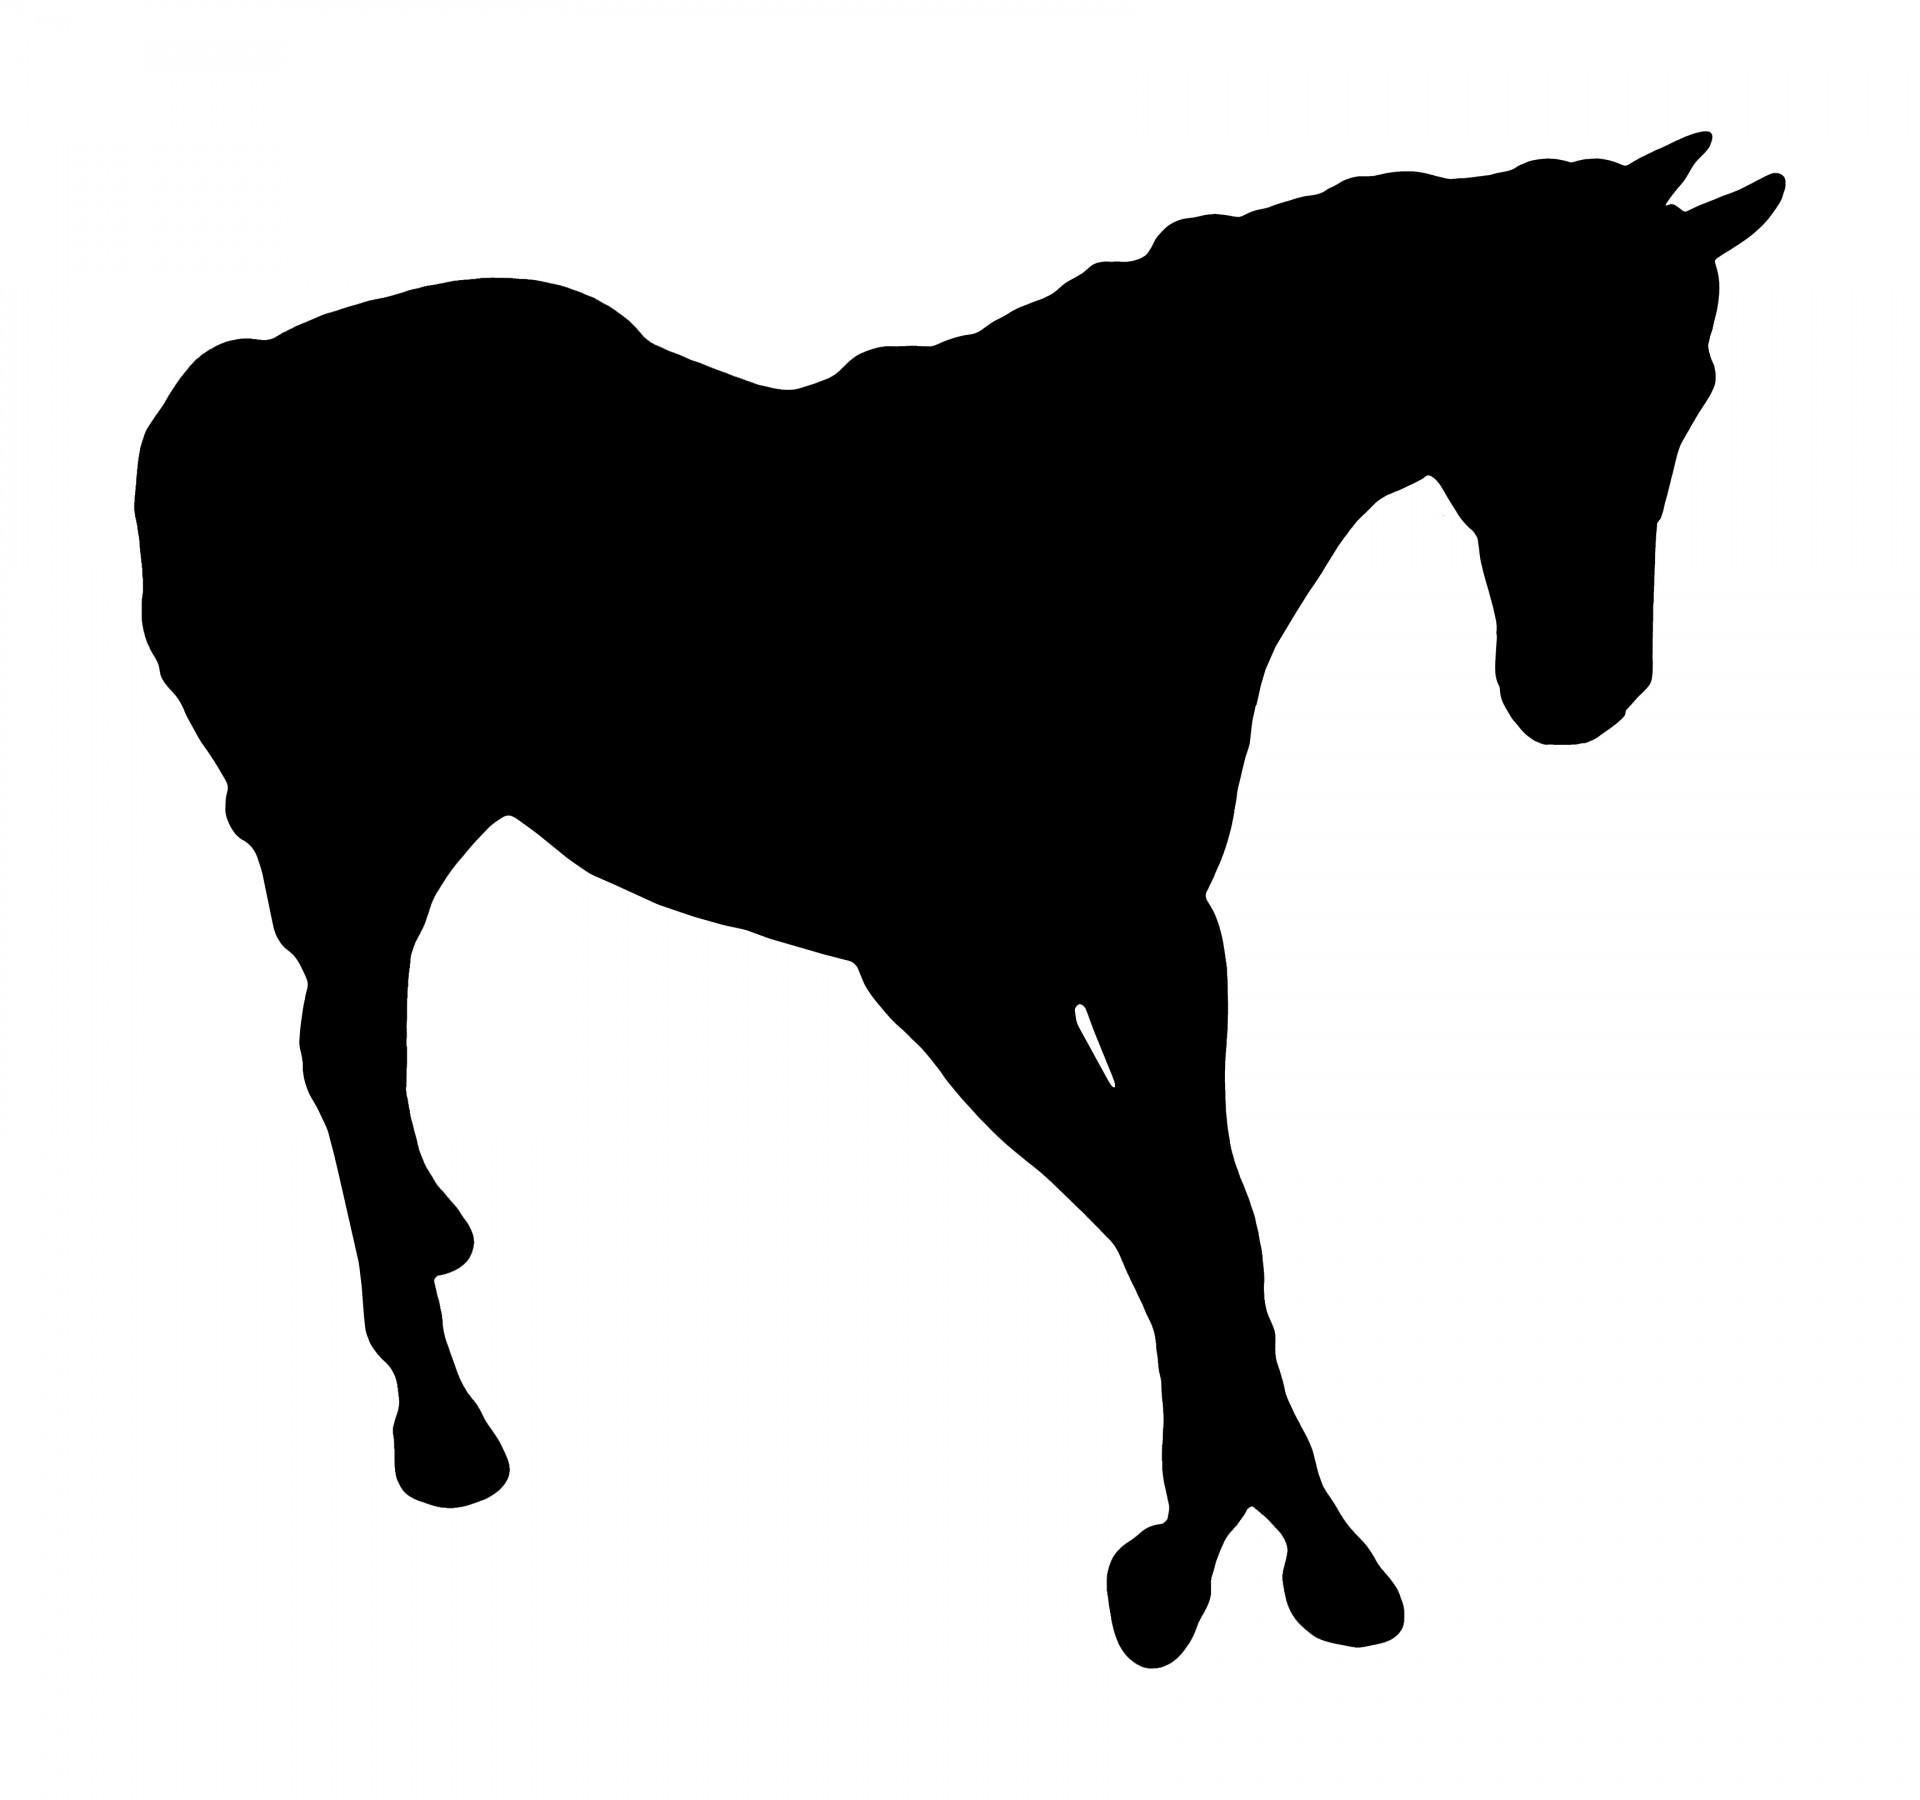 1920x1800 Horse Silhouette Free Stock Photo